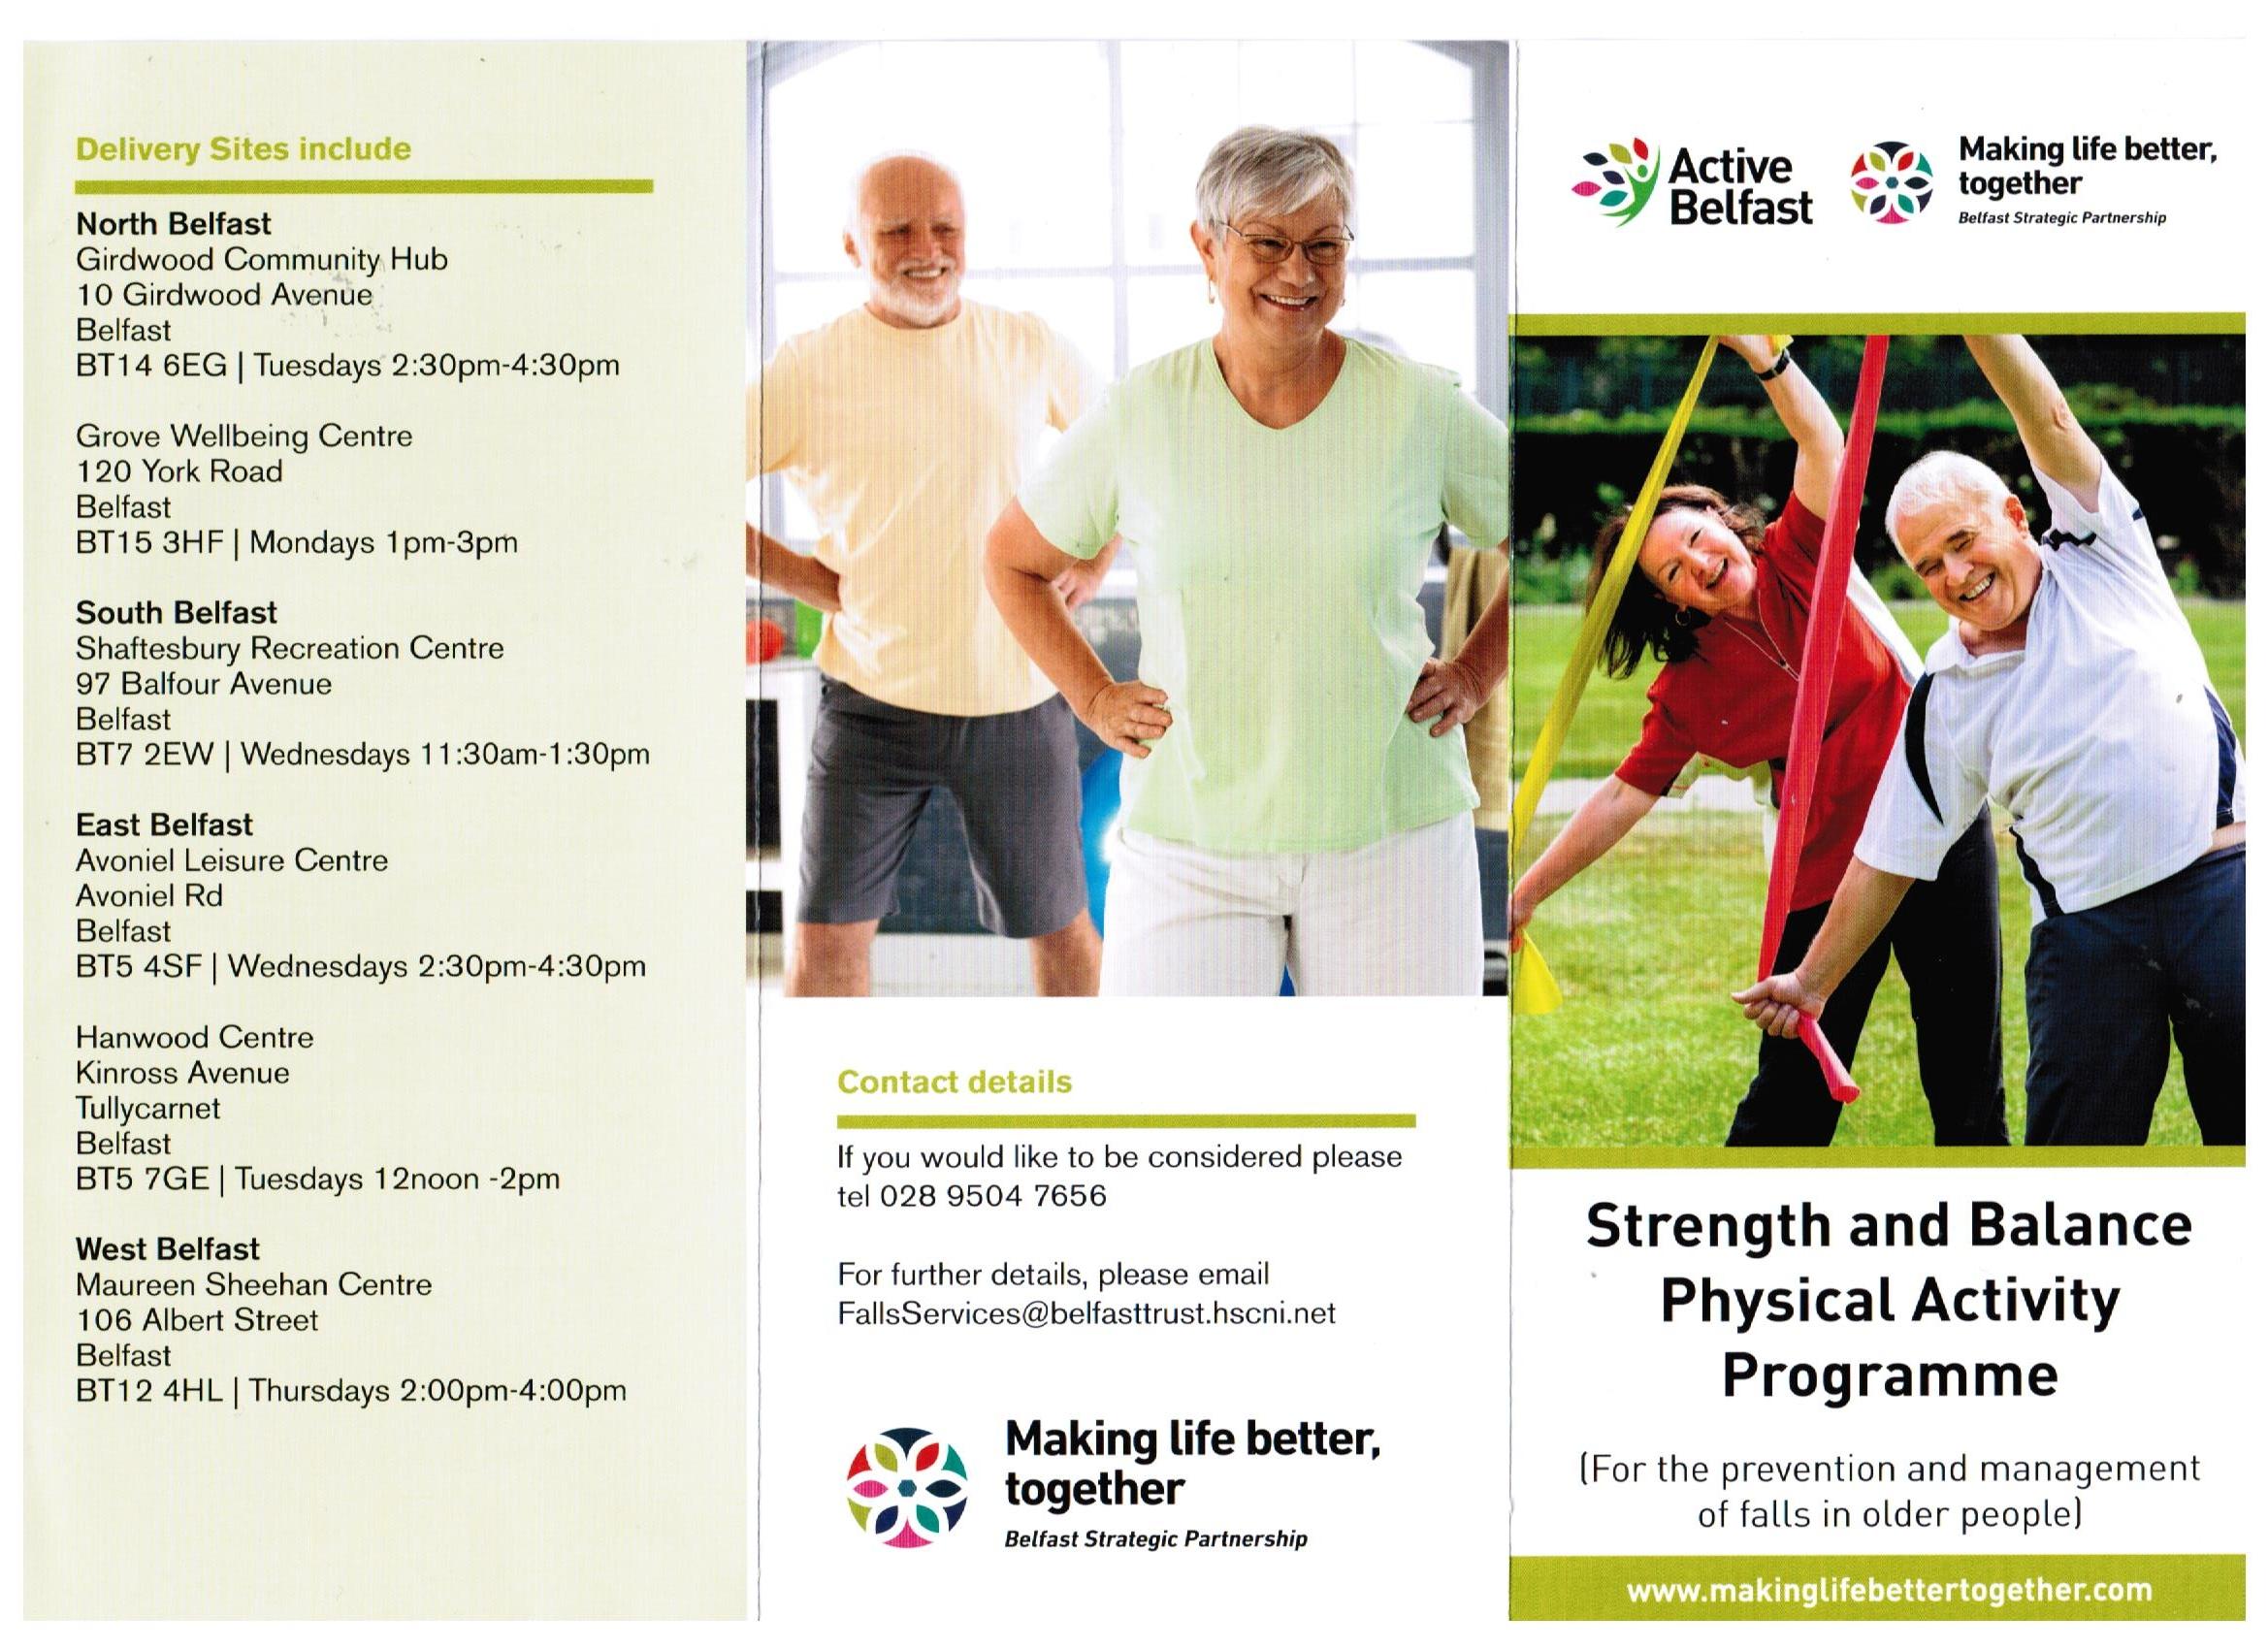 STRENGTH & BALANCE PHYSICAL ACTIVITY PROGRAMME